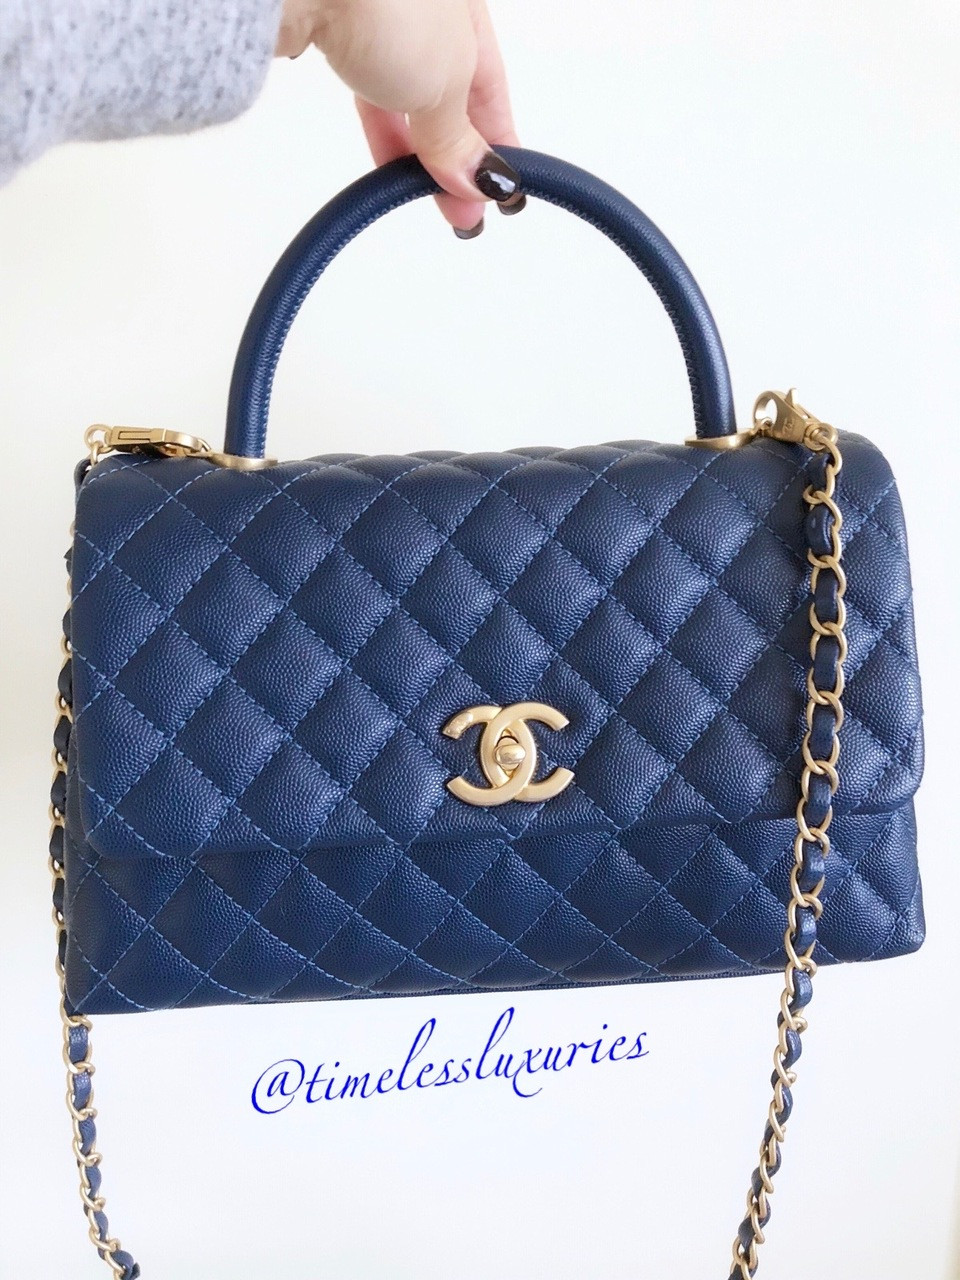 c58a48bcb4ff CHANEL 2018 Blue Caviar Coco Handle Bag Gold Hw #25709771 - Timeless ...